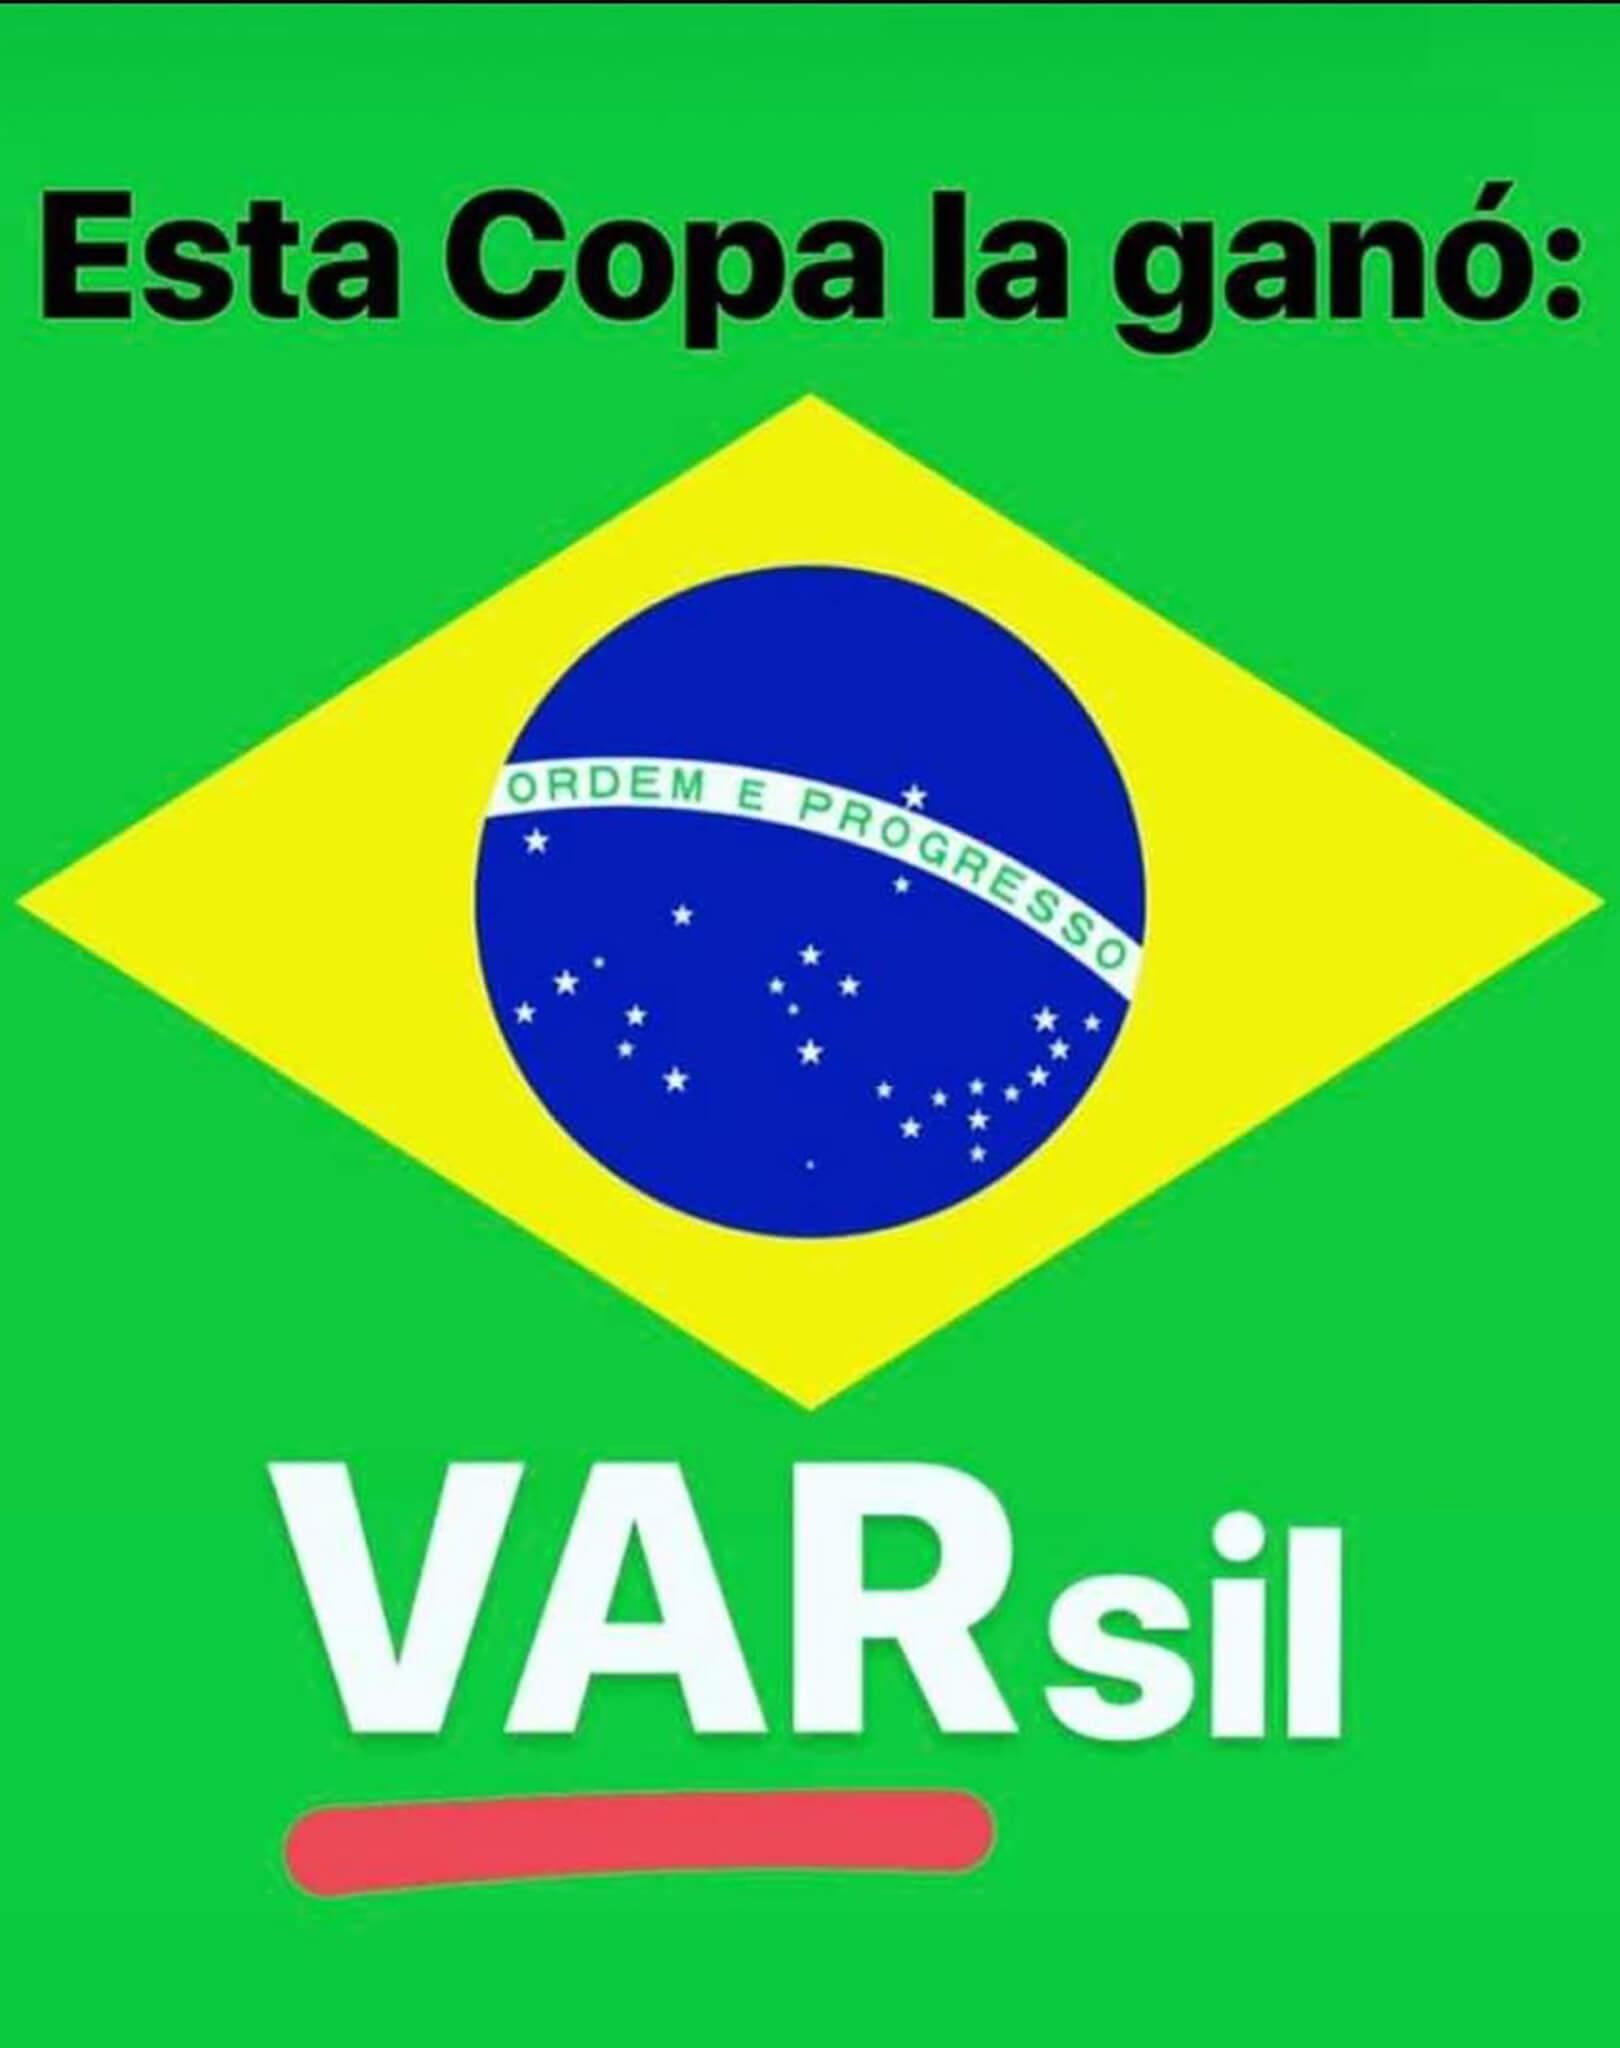 El mejor nombre de la Copa: VARSIL.